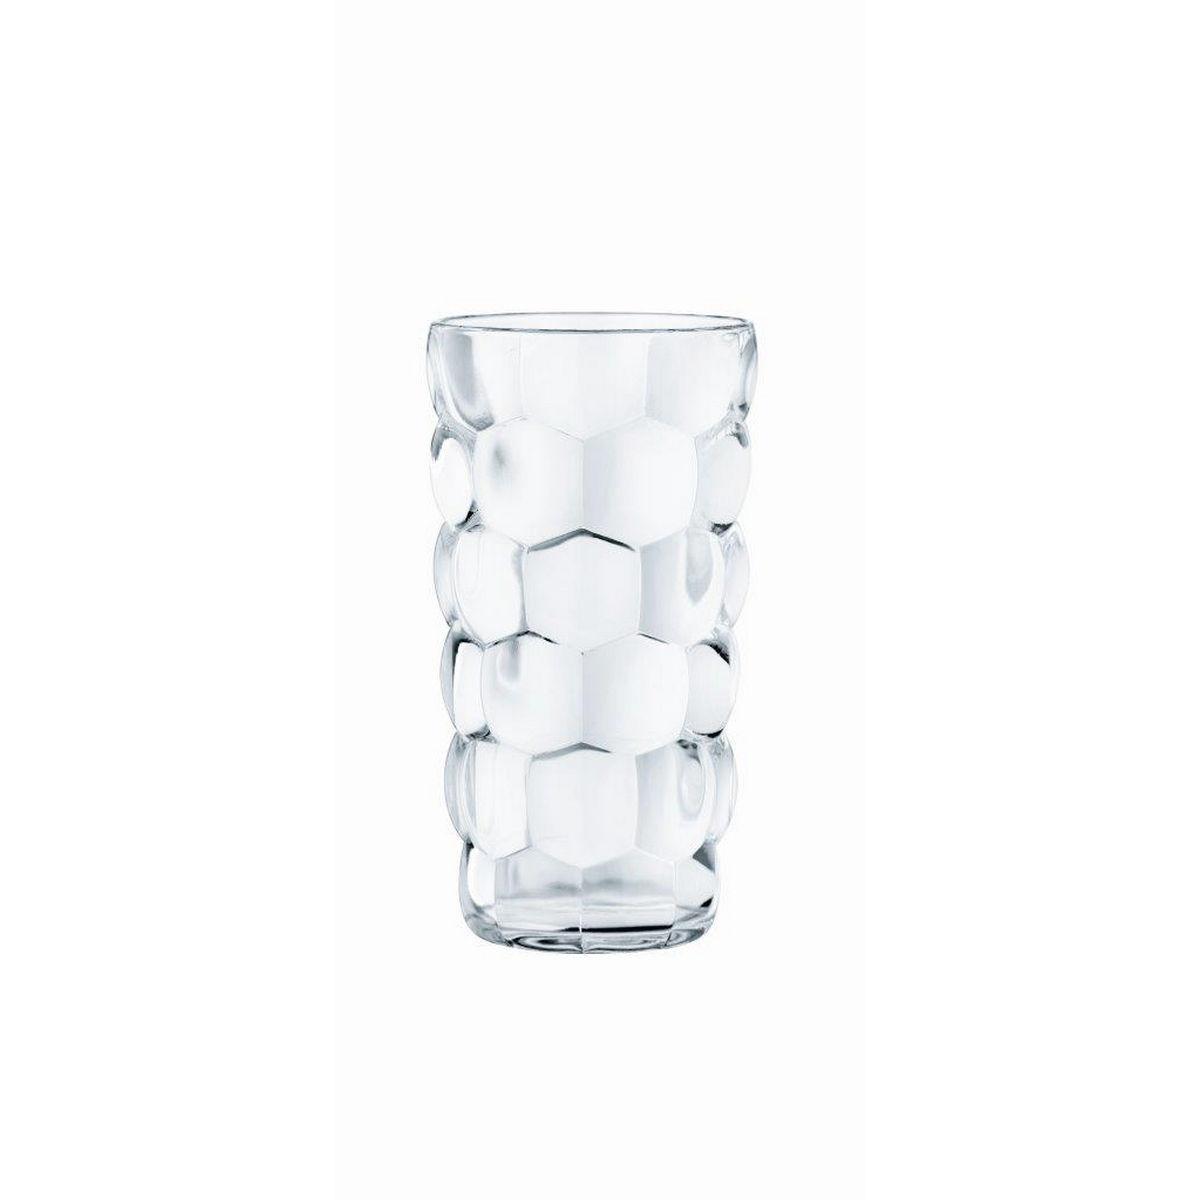 Bubbles Set 4 Pahare Cristalin Apa 390 Ml 2021 aranjareamesei.ro